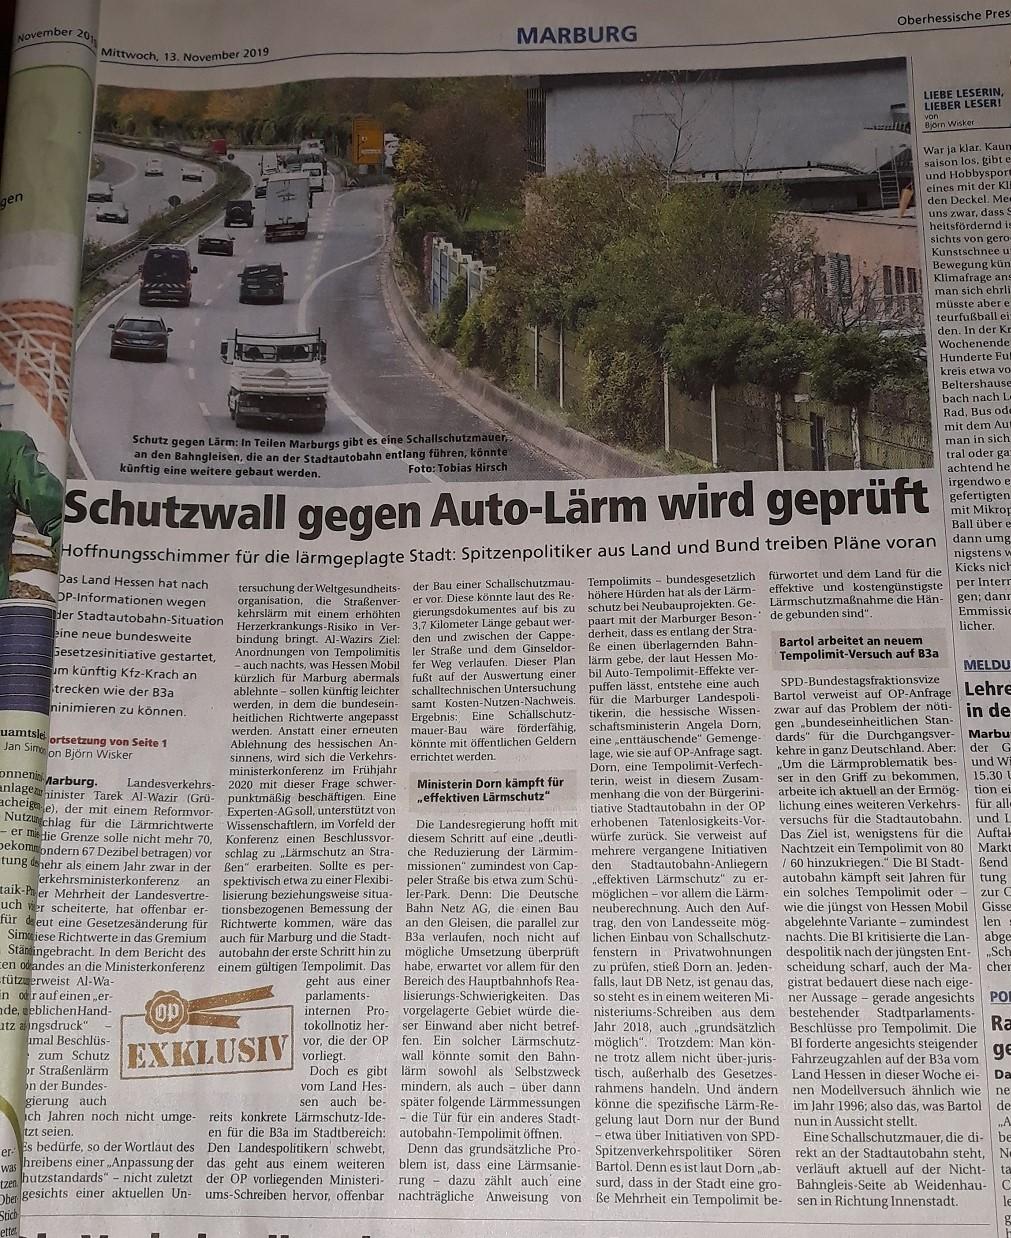 13. Nov. 2019 OP Schutzwall